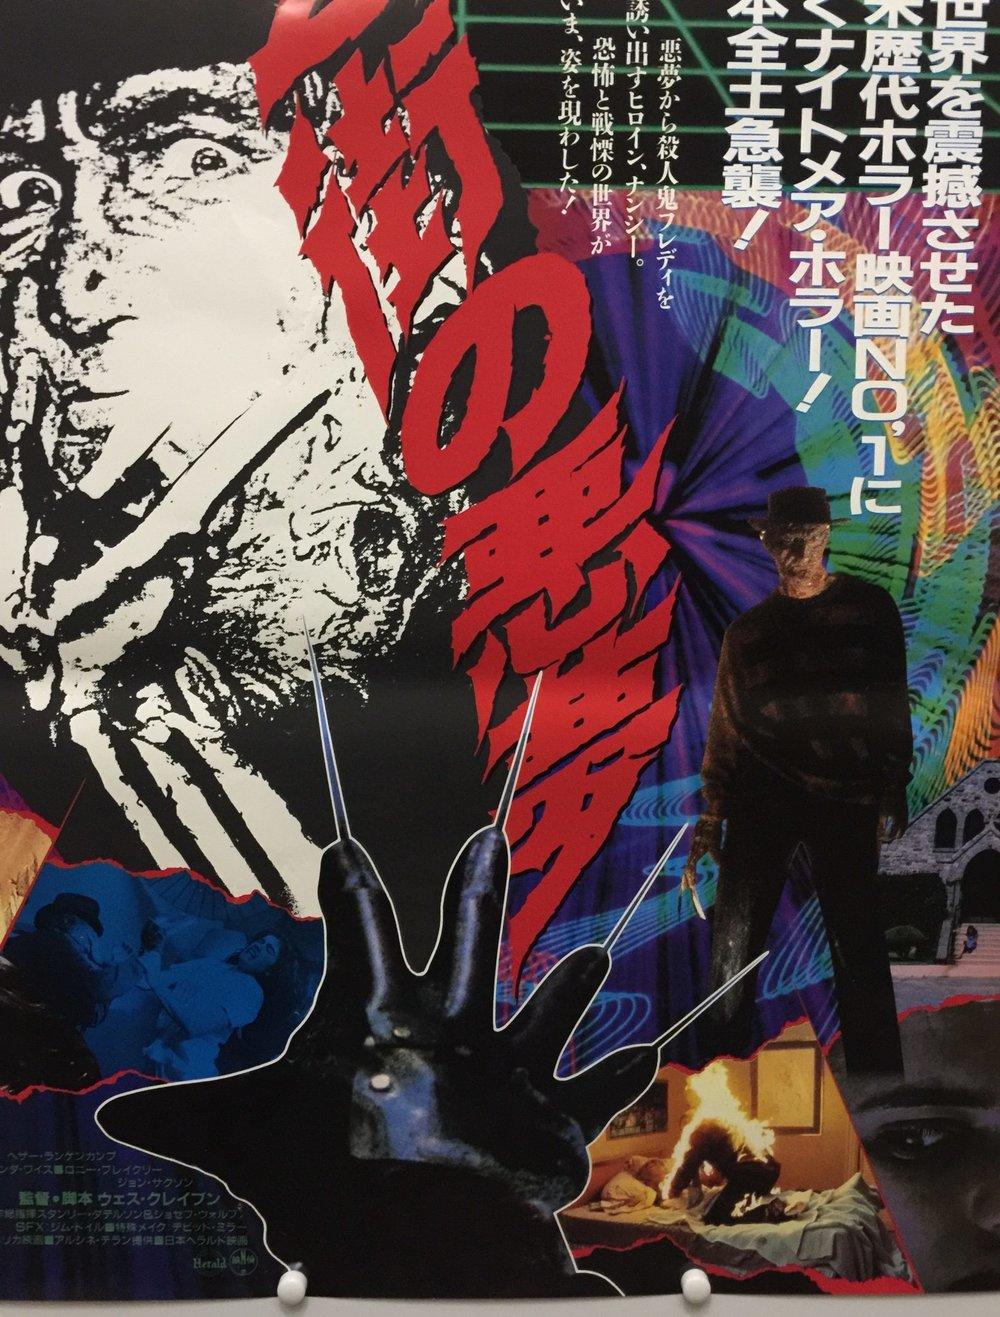 nightmare-on-elm-street-japan-b2-5.jpg